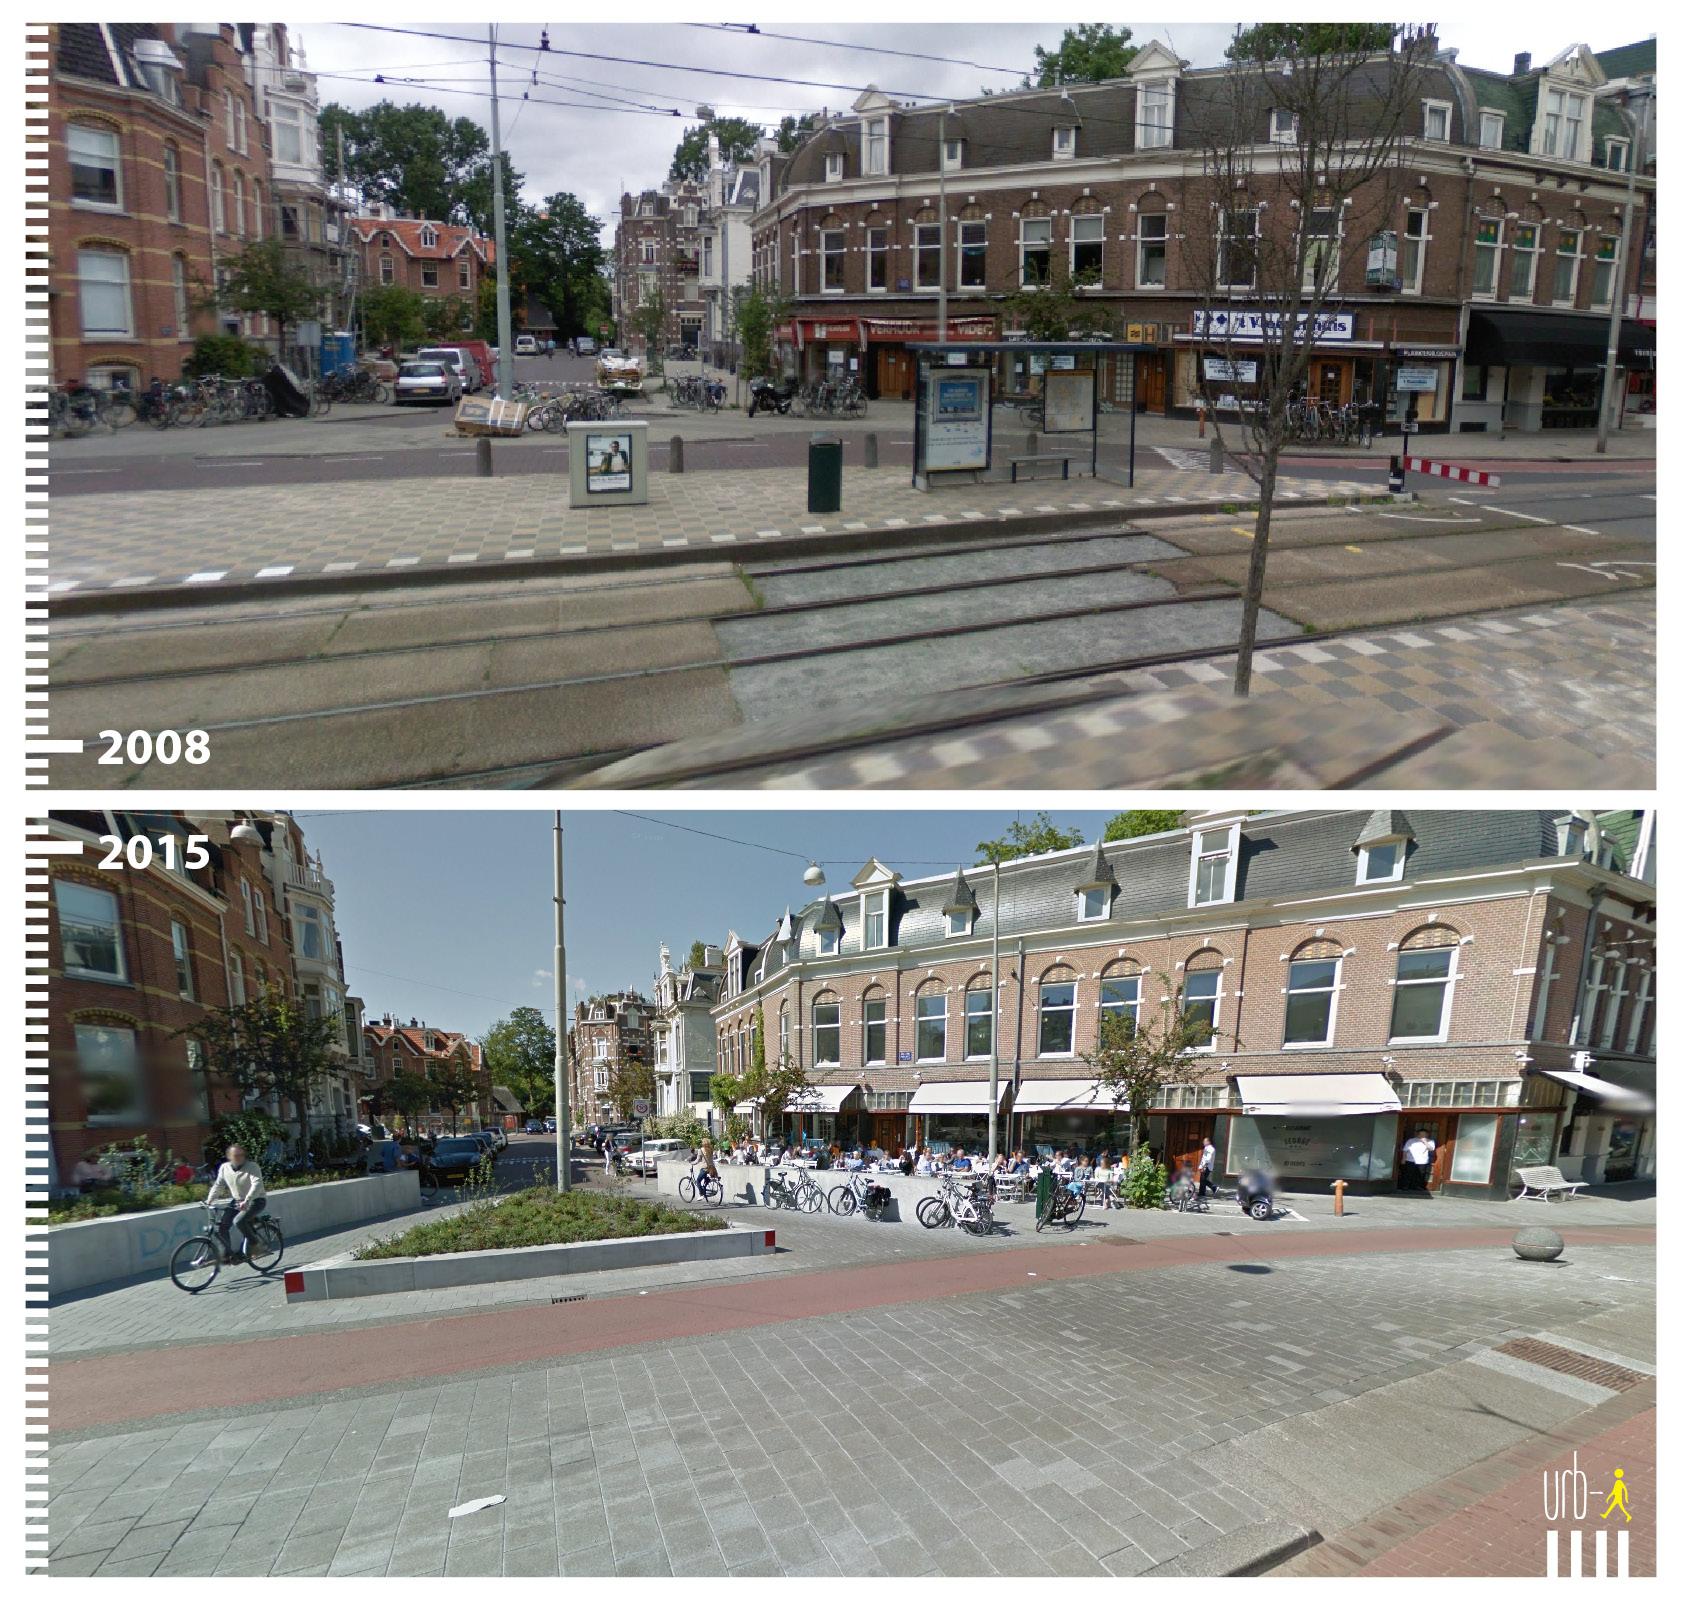 0840 NL Amsterdam, Willemsparkweg